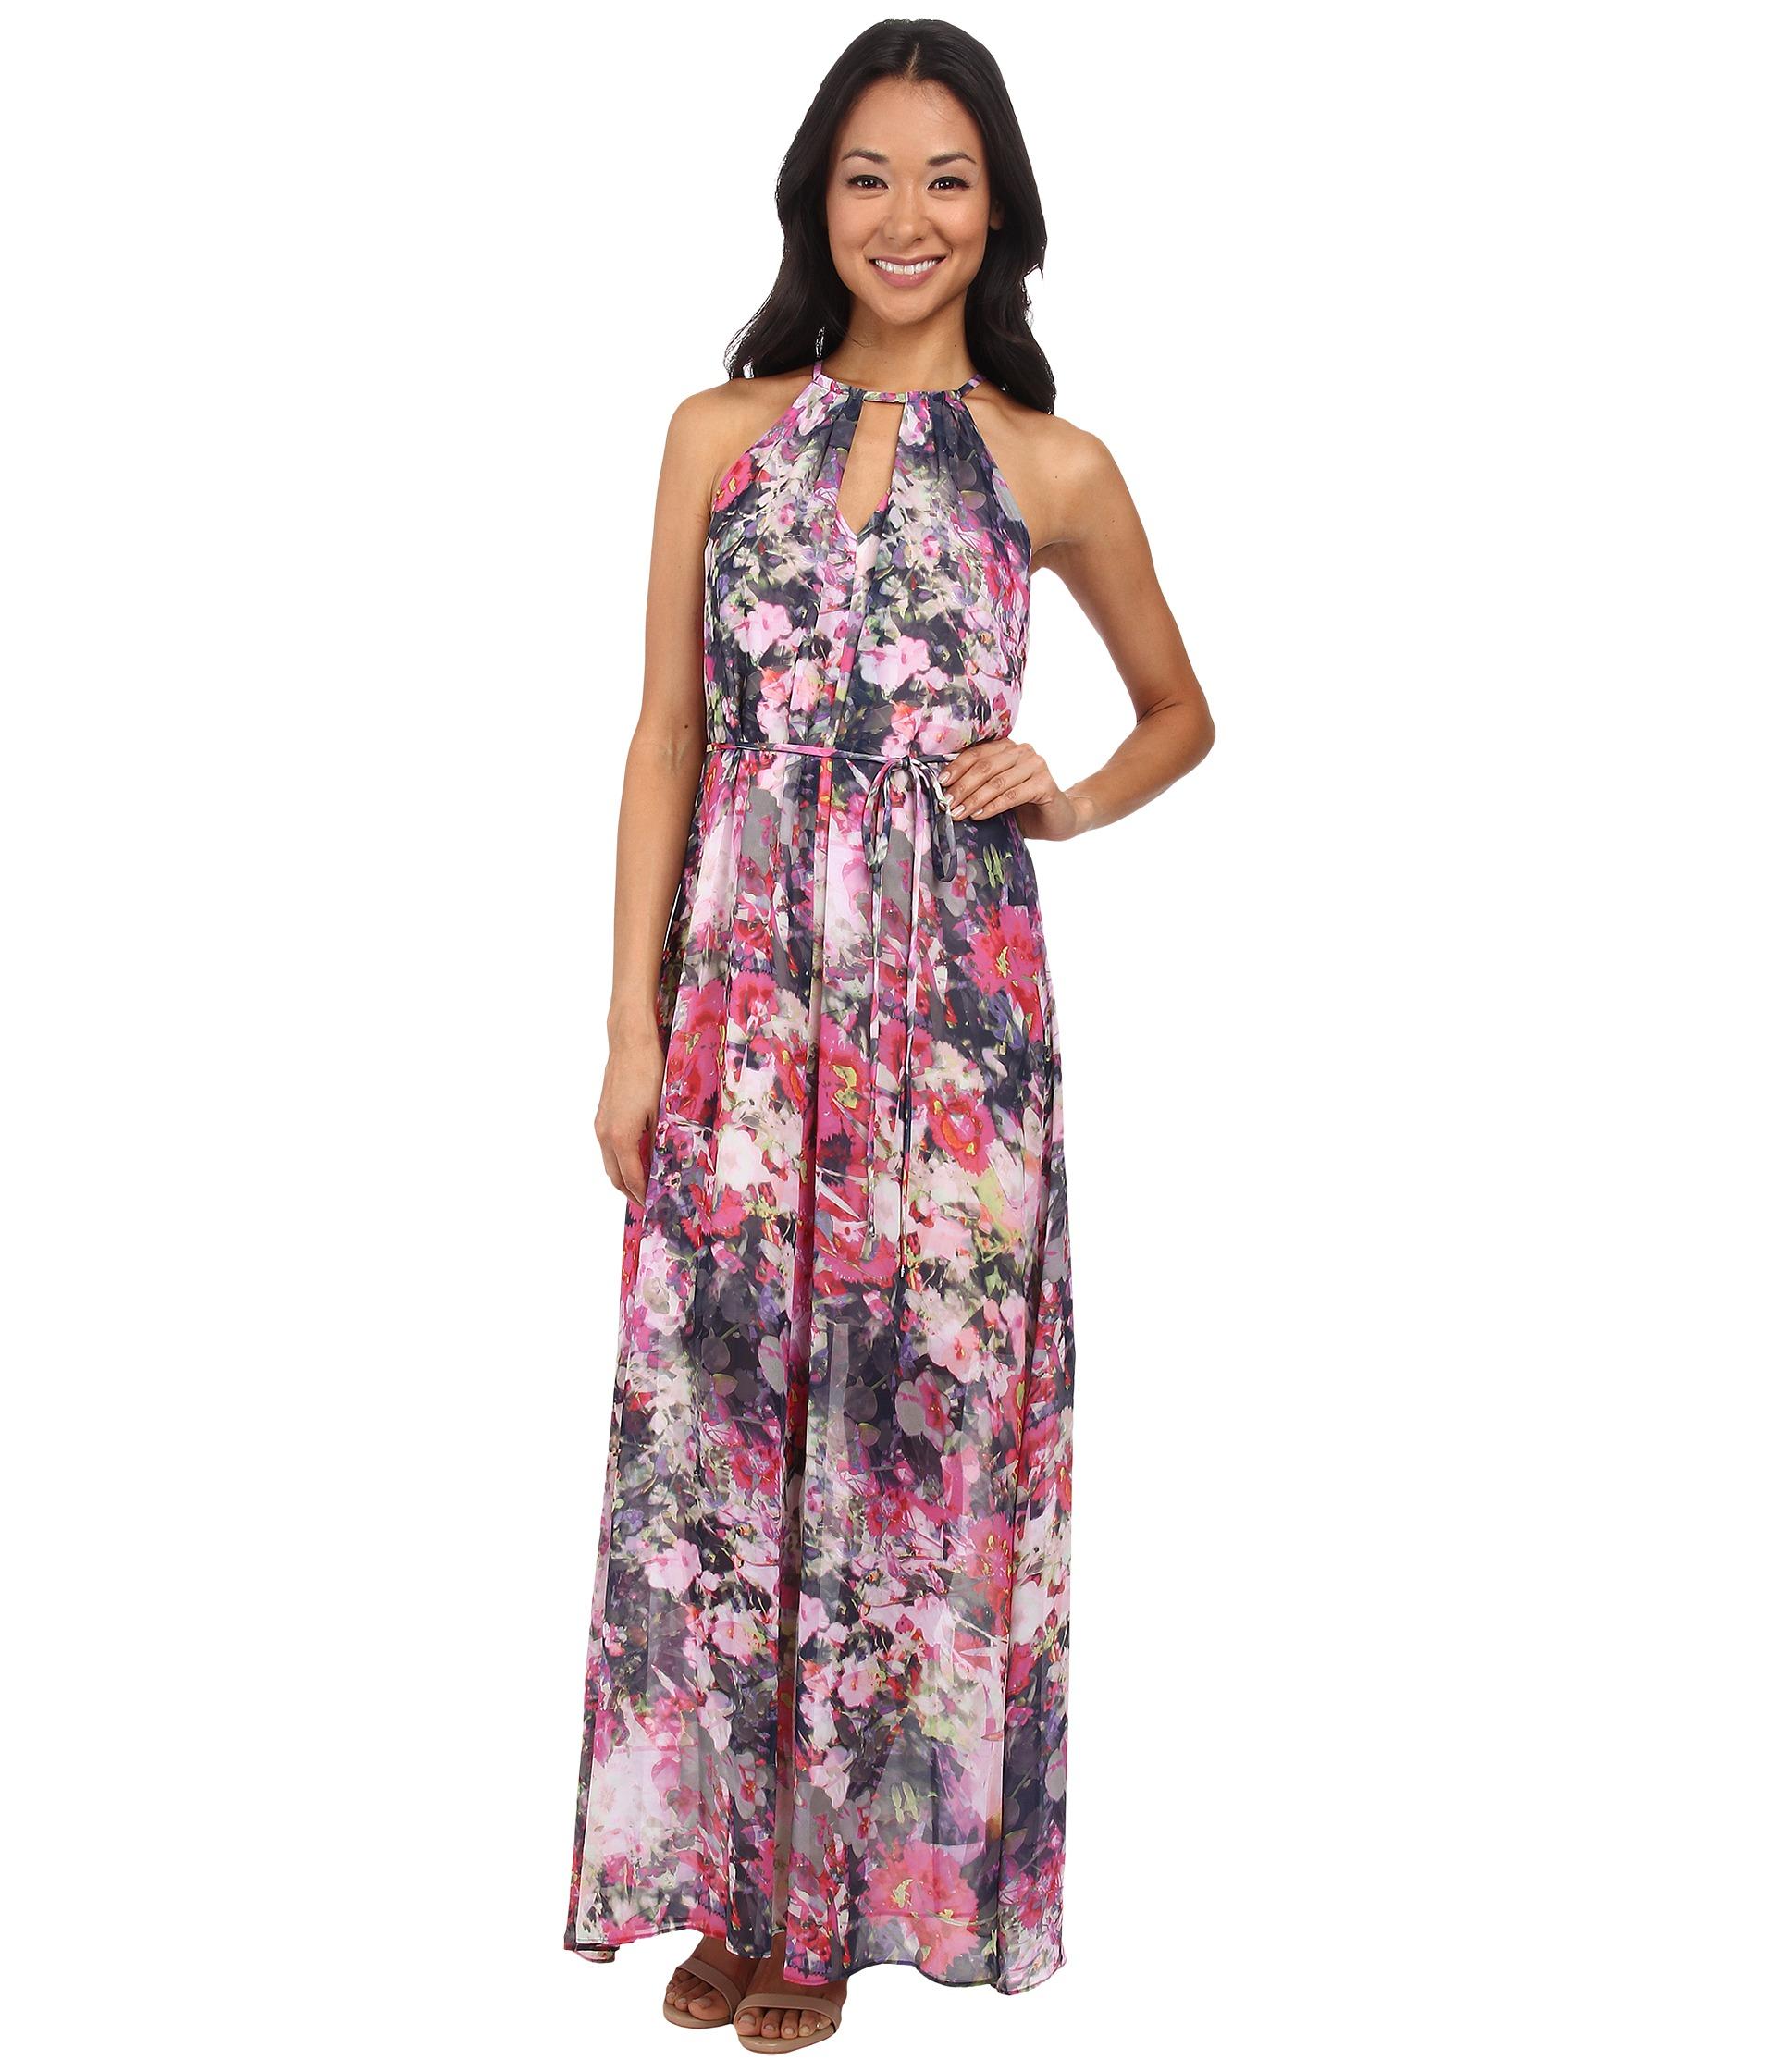 Maggy London Flower Mix Printed Chiffon Maxi Dress Lyst